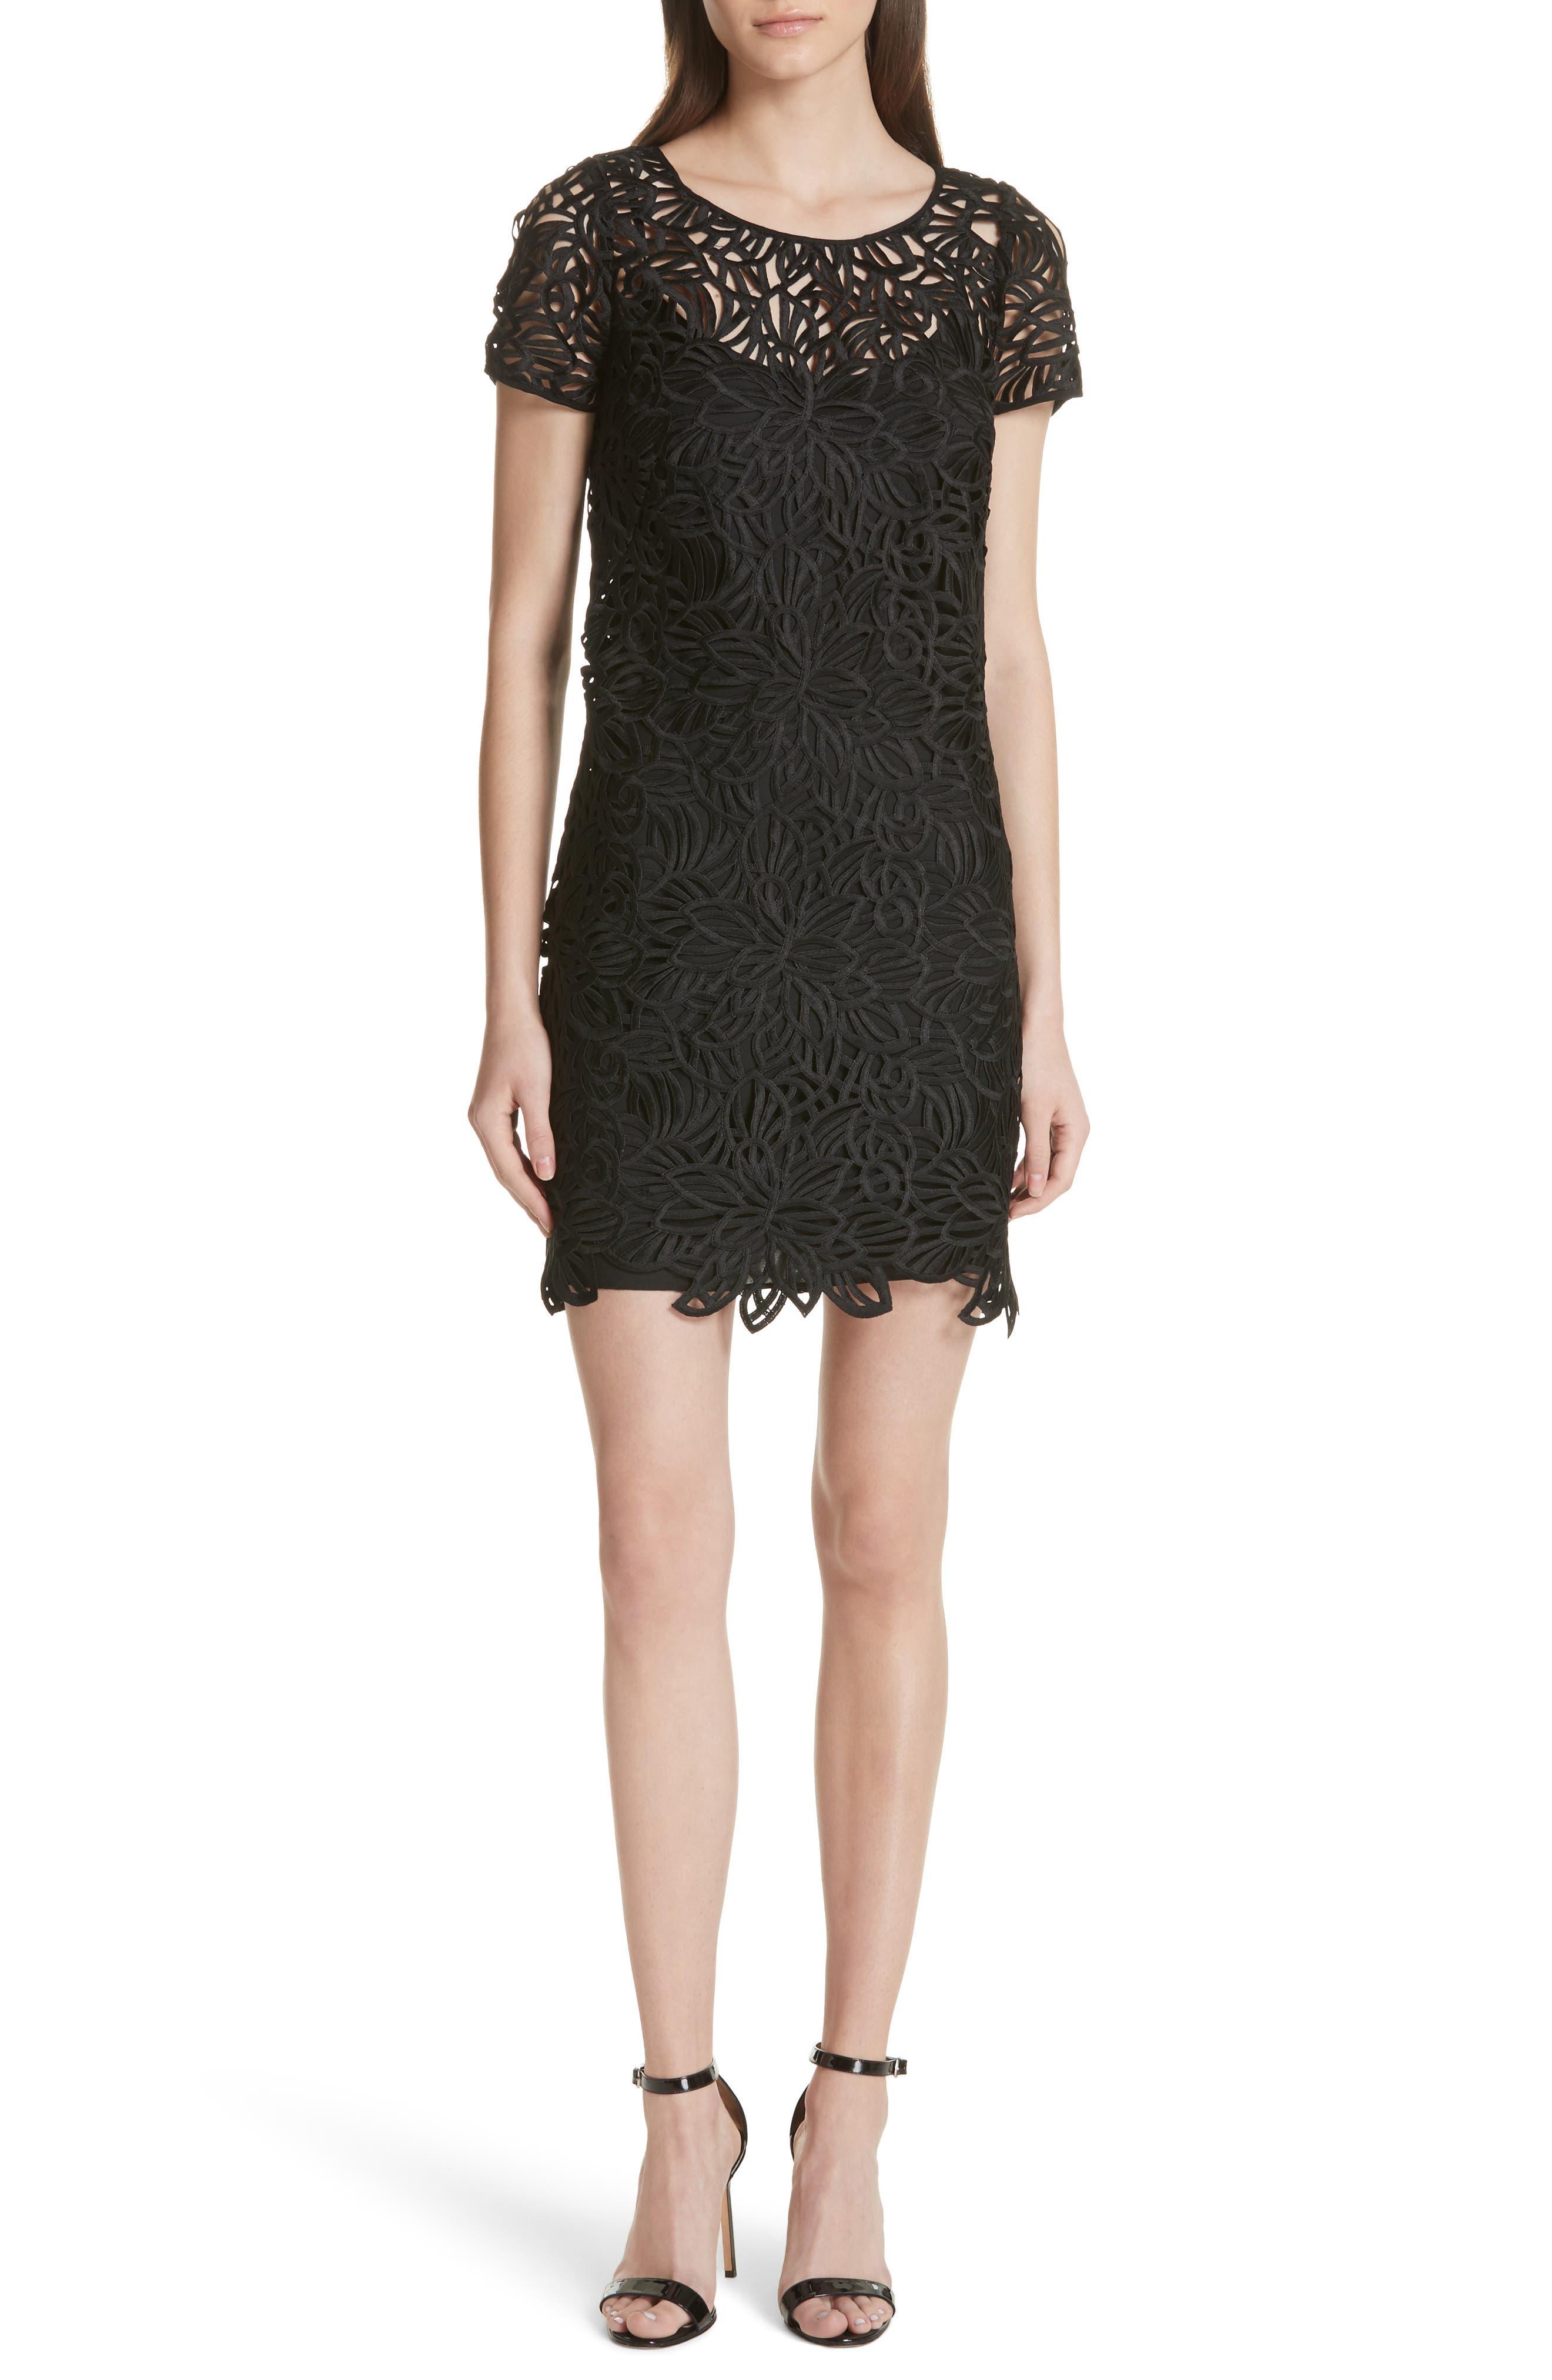 Chloe Lace Shift Dress,                         Main,                         color, Black